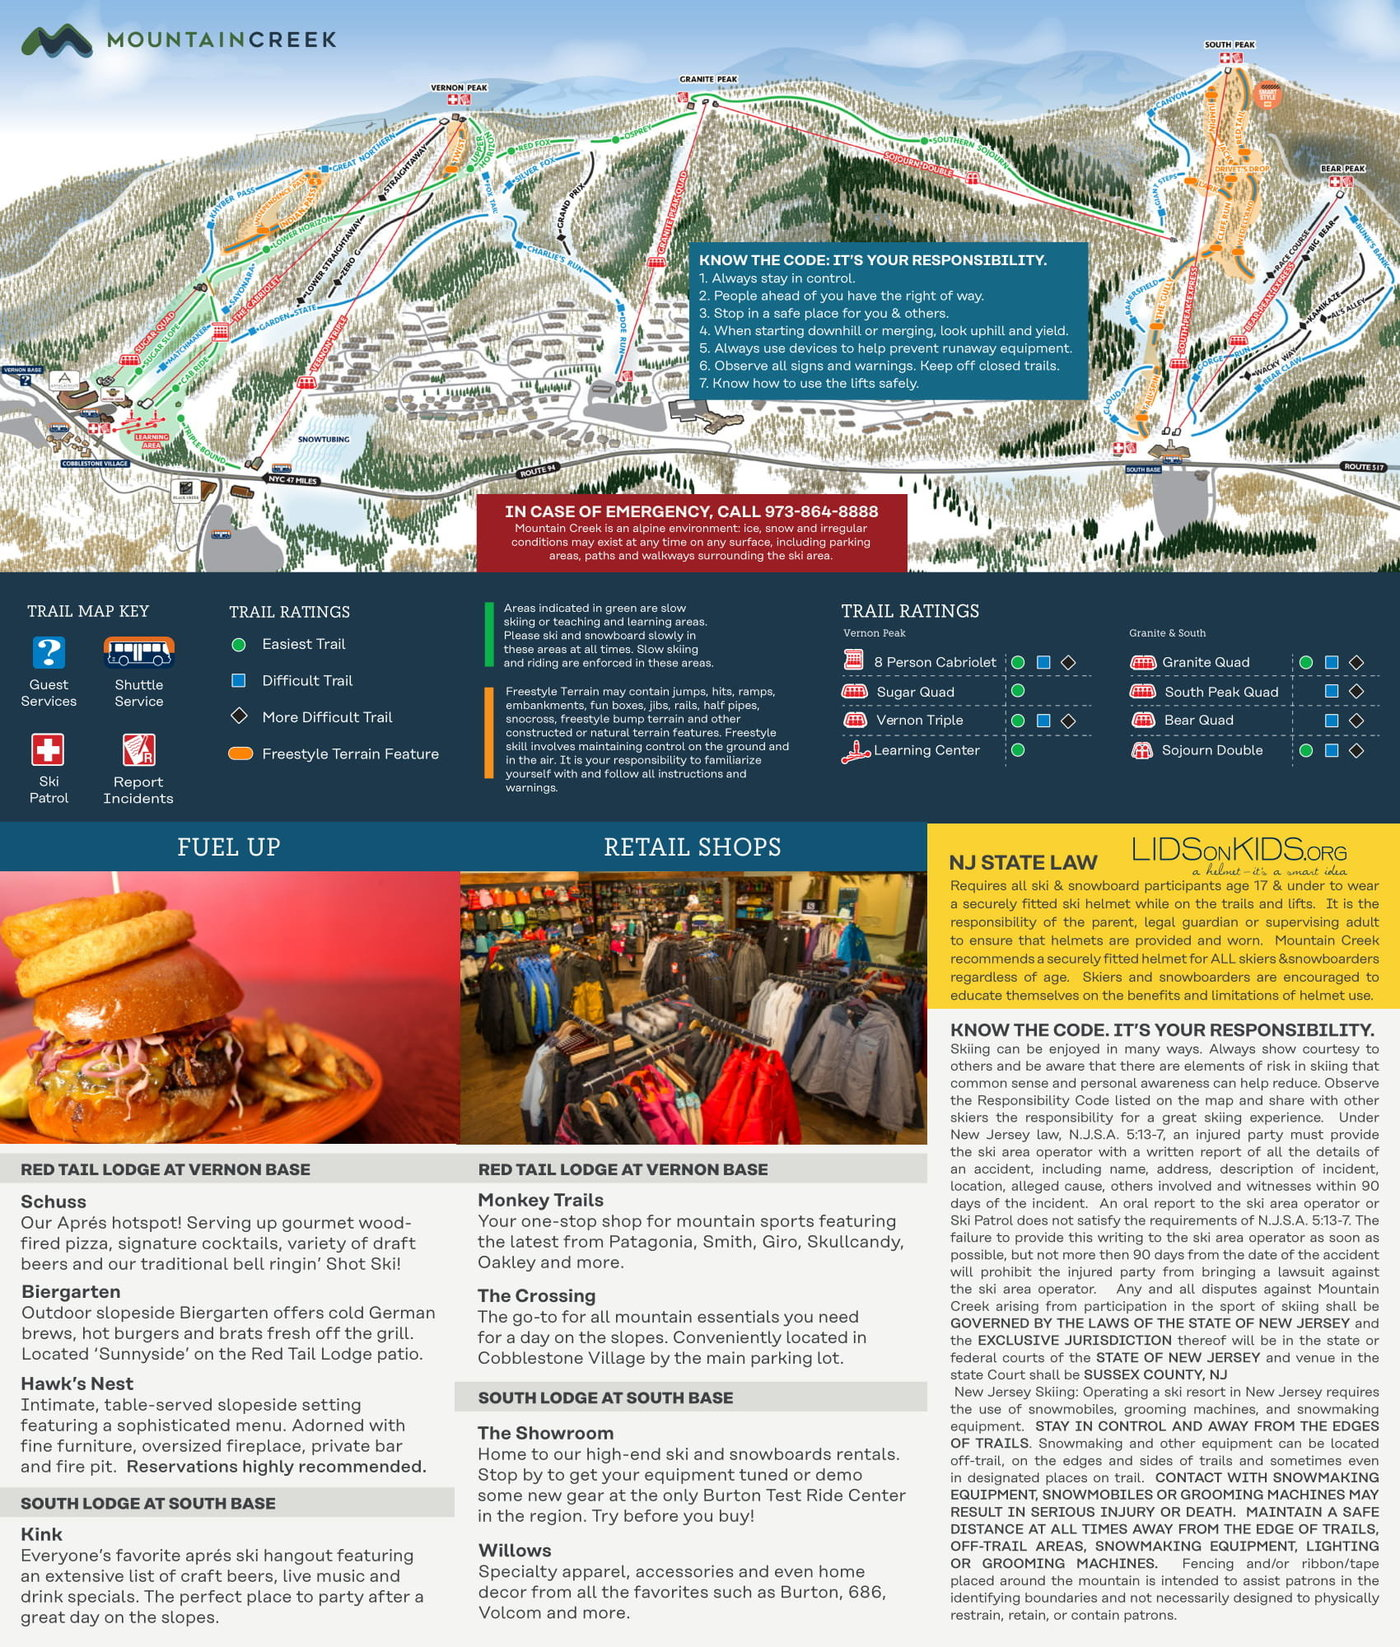 Mountain Creek Resort Trail Map